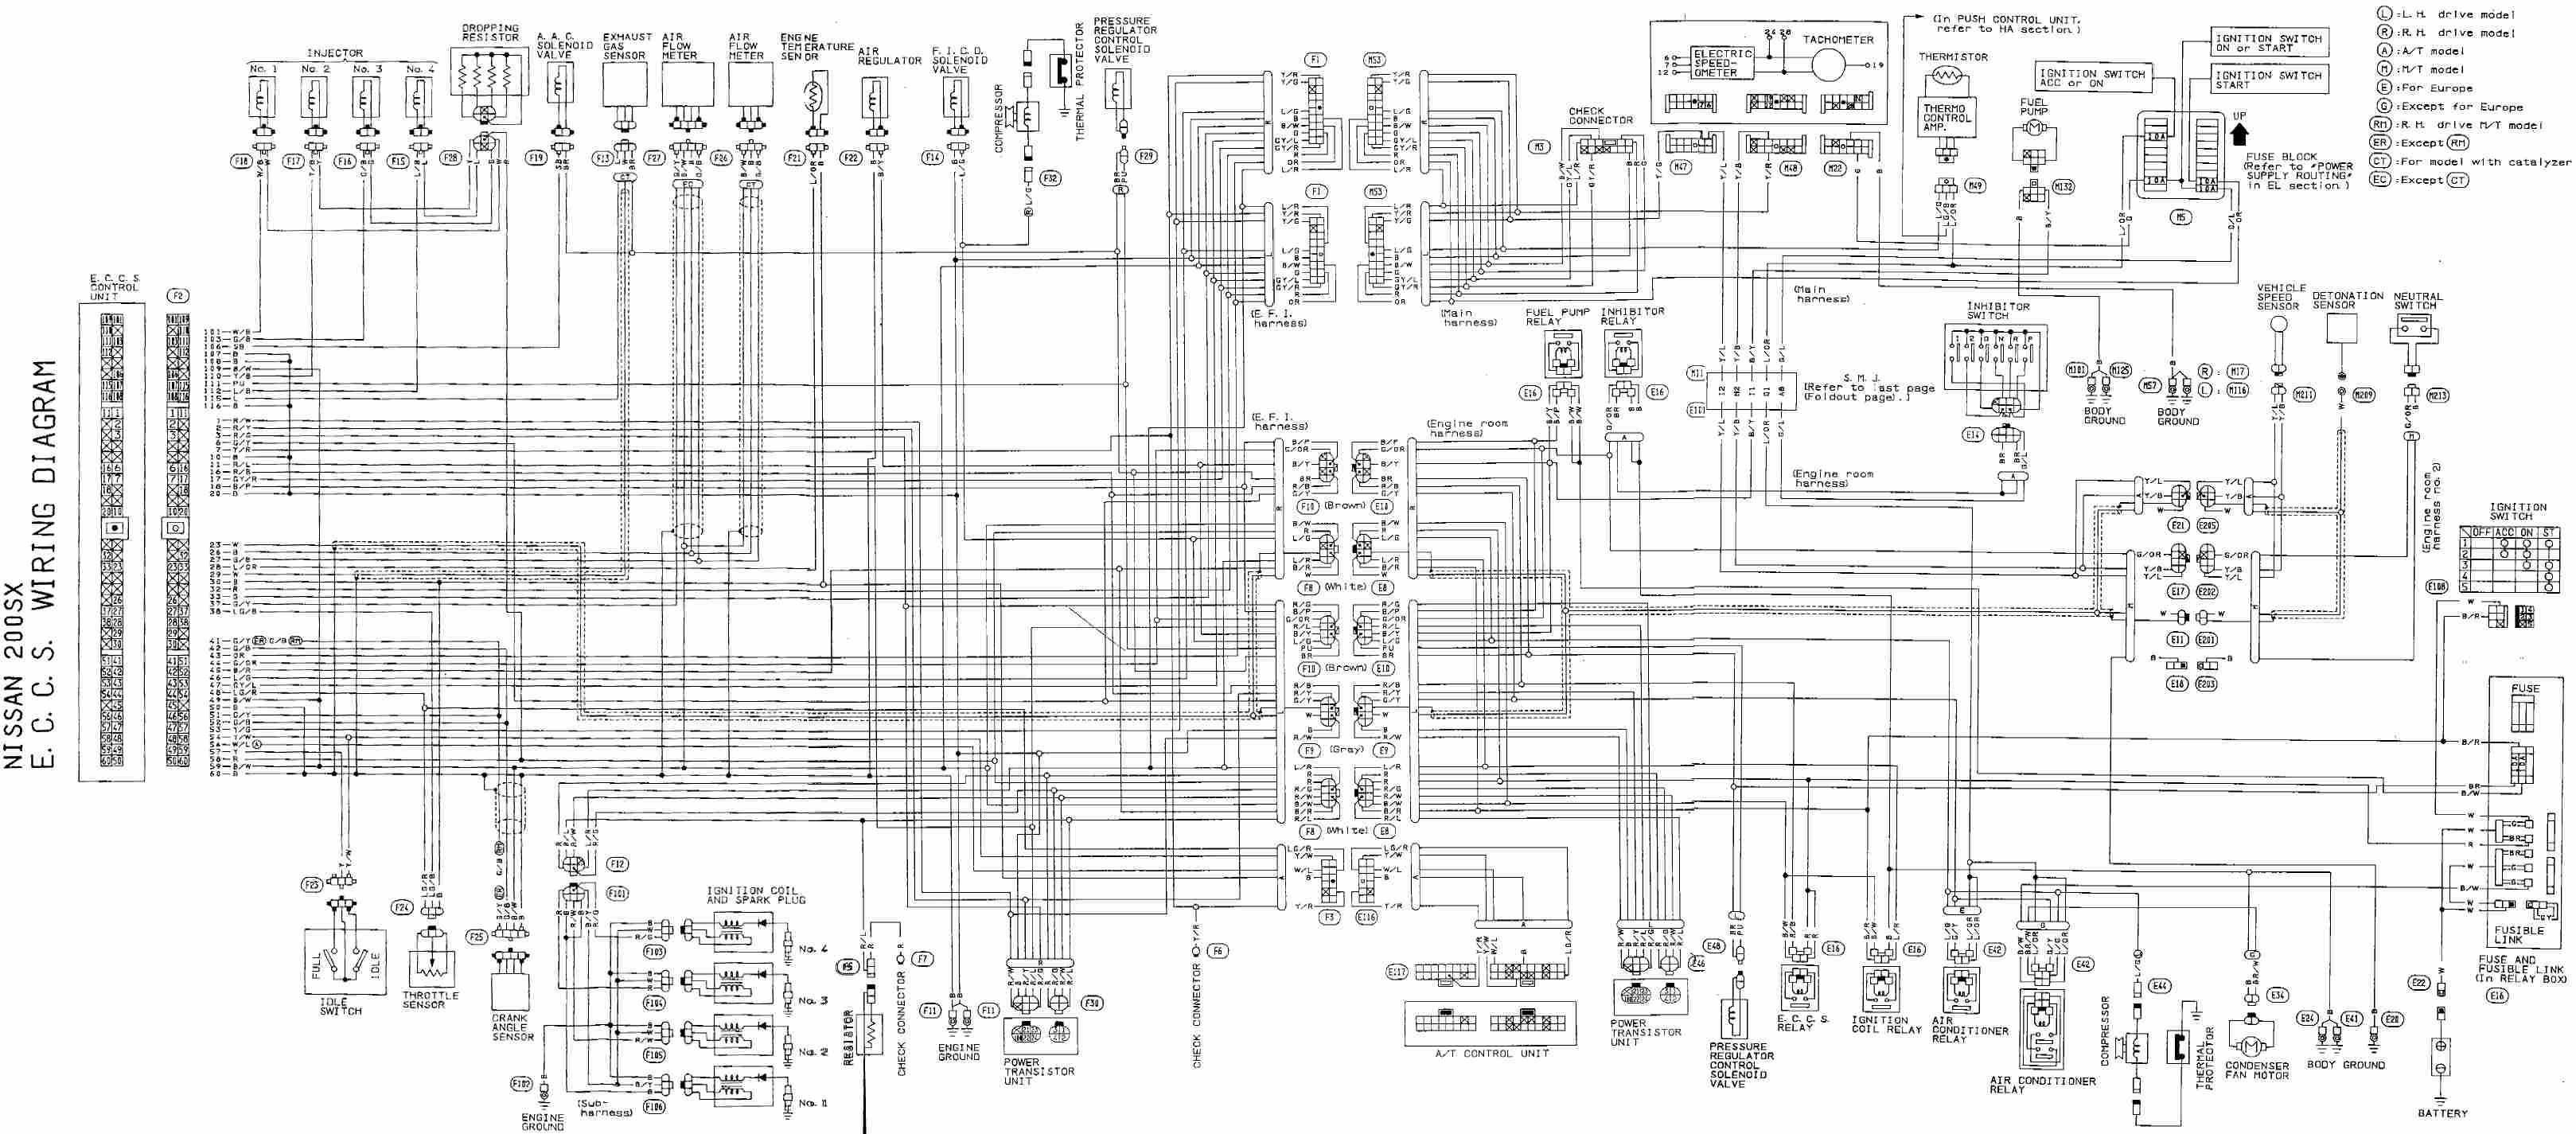 ac diagram auto electrical wiring diagrams collision body repair rh detoxicrecenze com nissan note radio wiring diagram nissan note radio wiring diagram